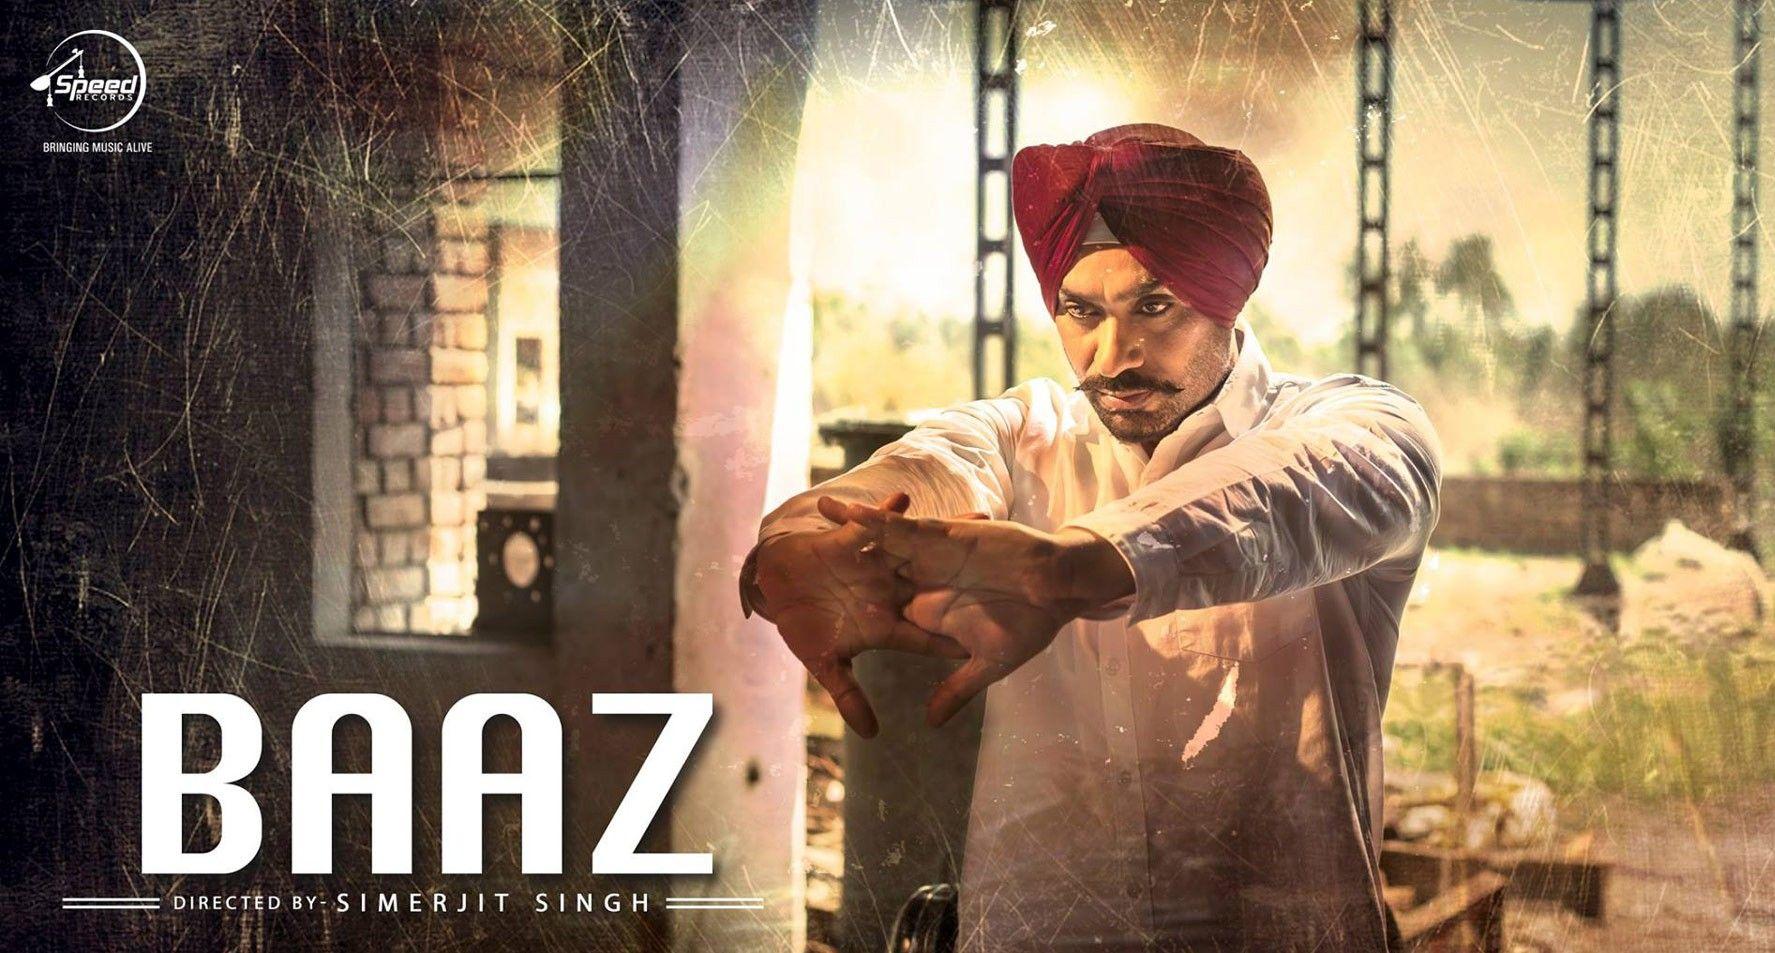 Download Baaz Full-Movie Free